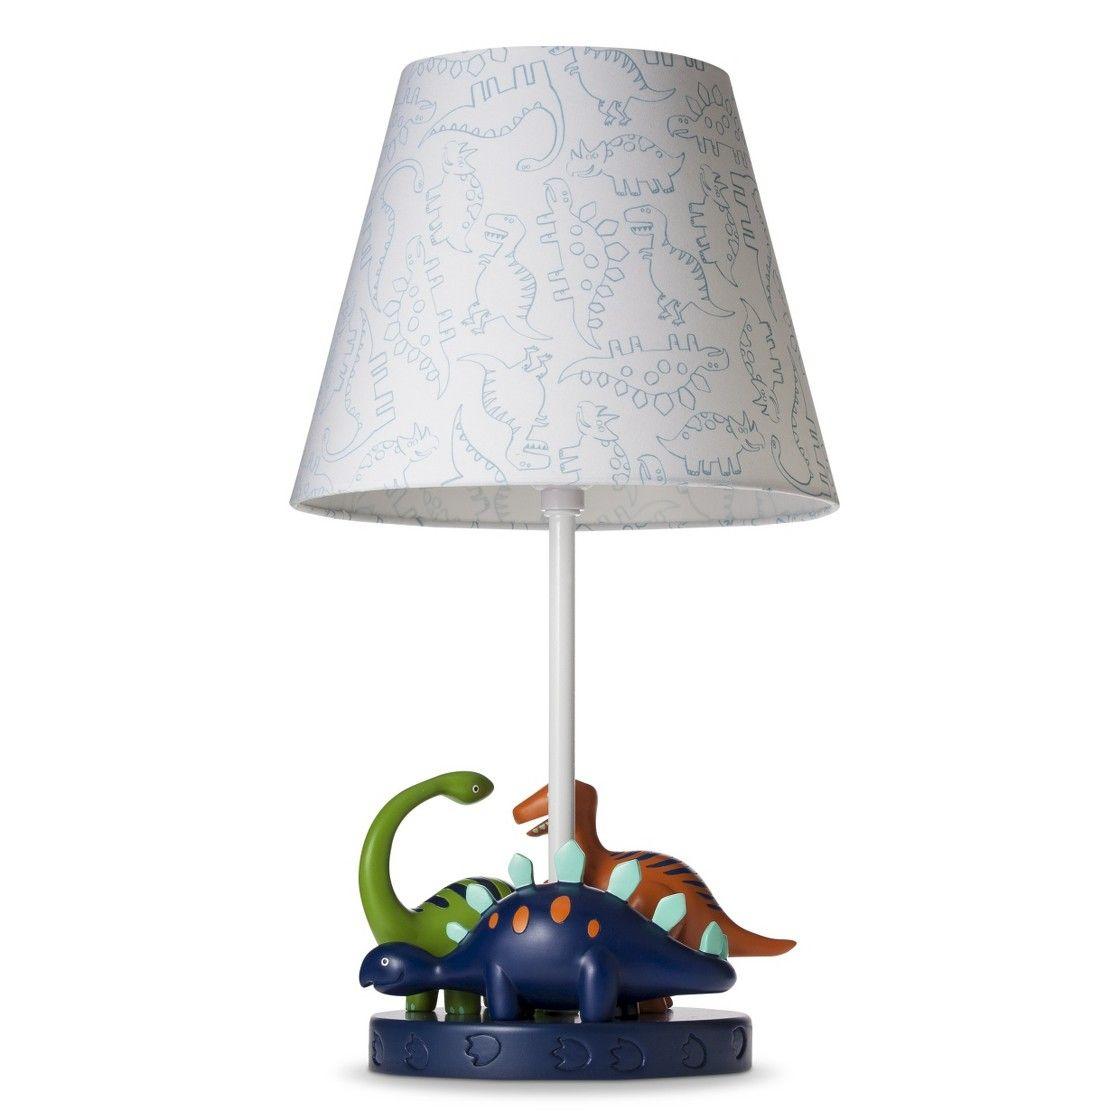 Triple tap to zoom in peyton wayne pinterest room dinosaur rotary dinosaur lamp kid bedroom end table dresser decor night light mozeypictures Gallery